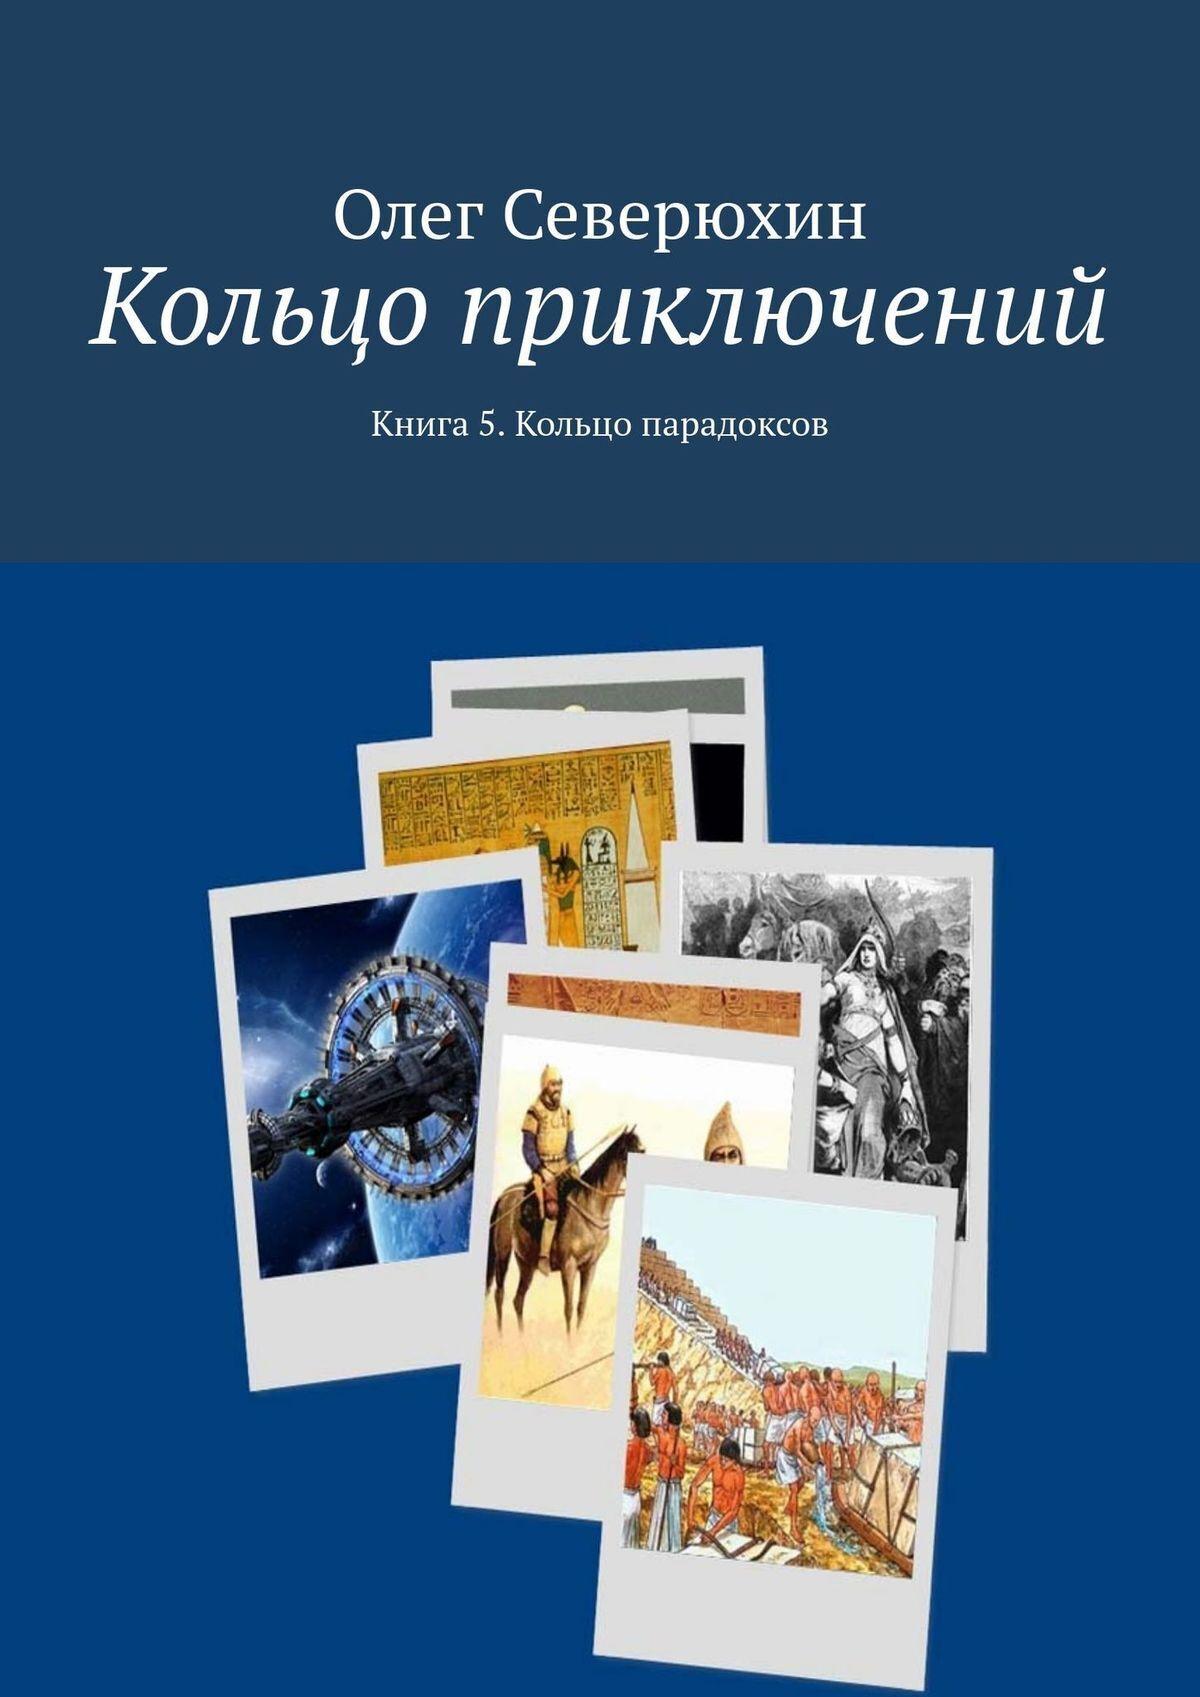 Олег Васильевич Северюхин Кольцо приключений. Книга 5. Кольцо парадоксов цена